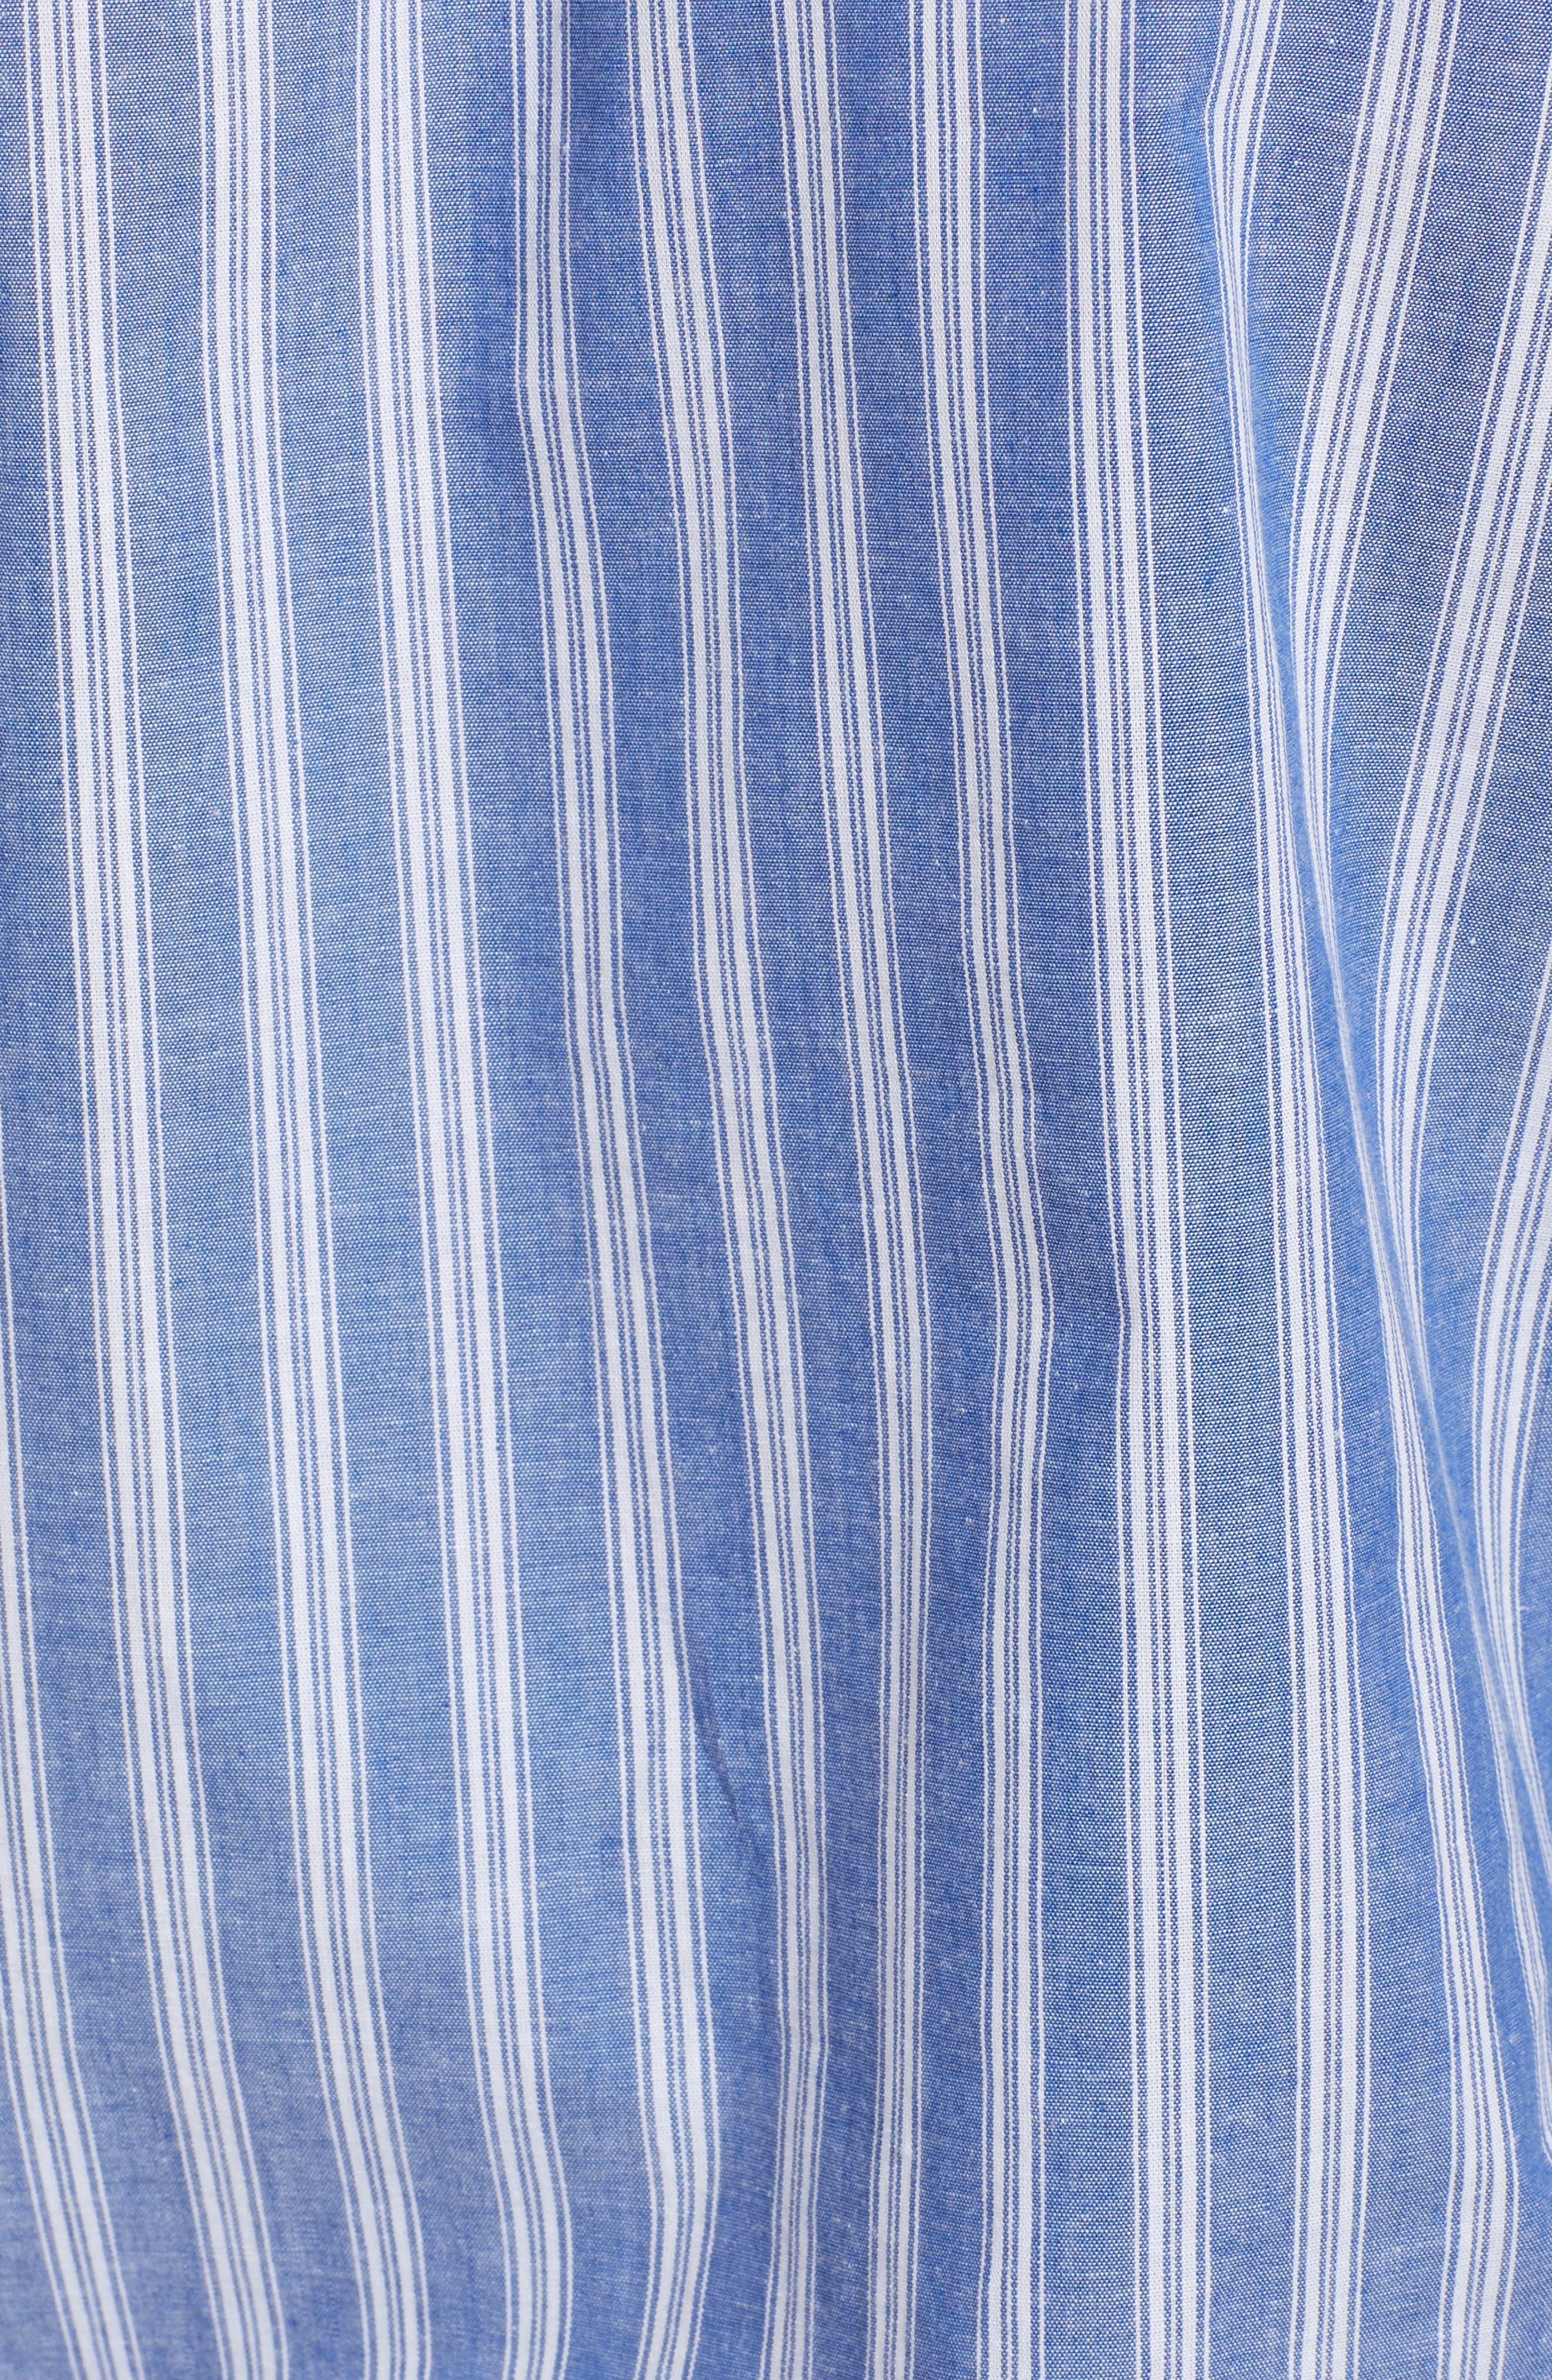 Stripe Tie Hem Top,                             Alternate thumbnail 6, color,                             Blue Celestial Stripe